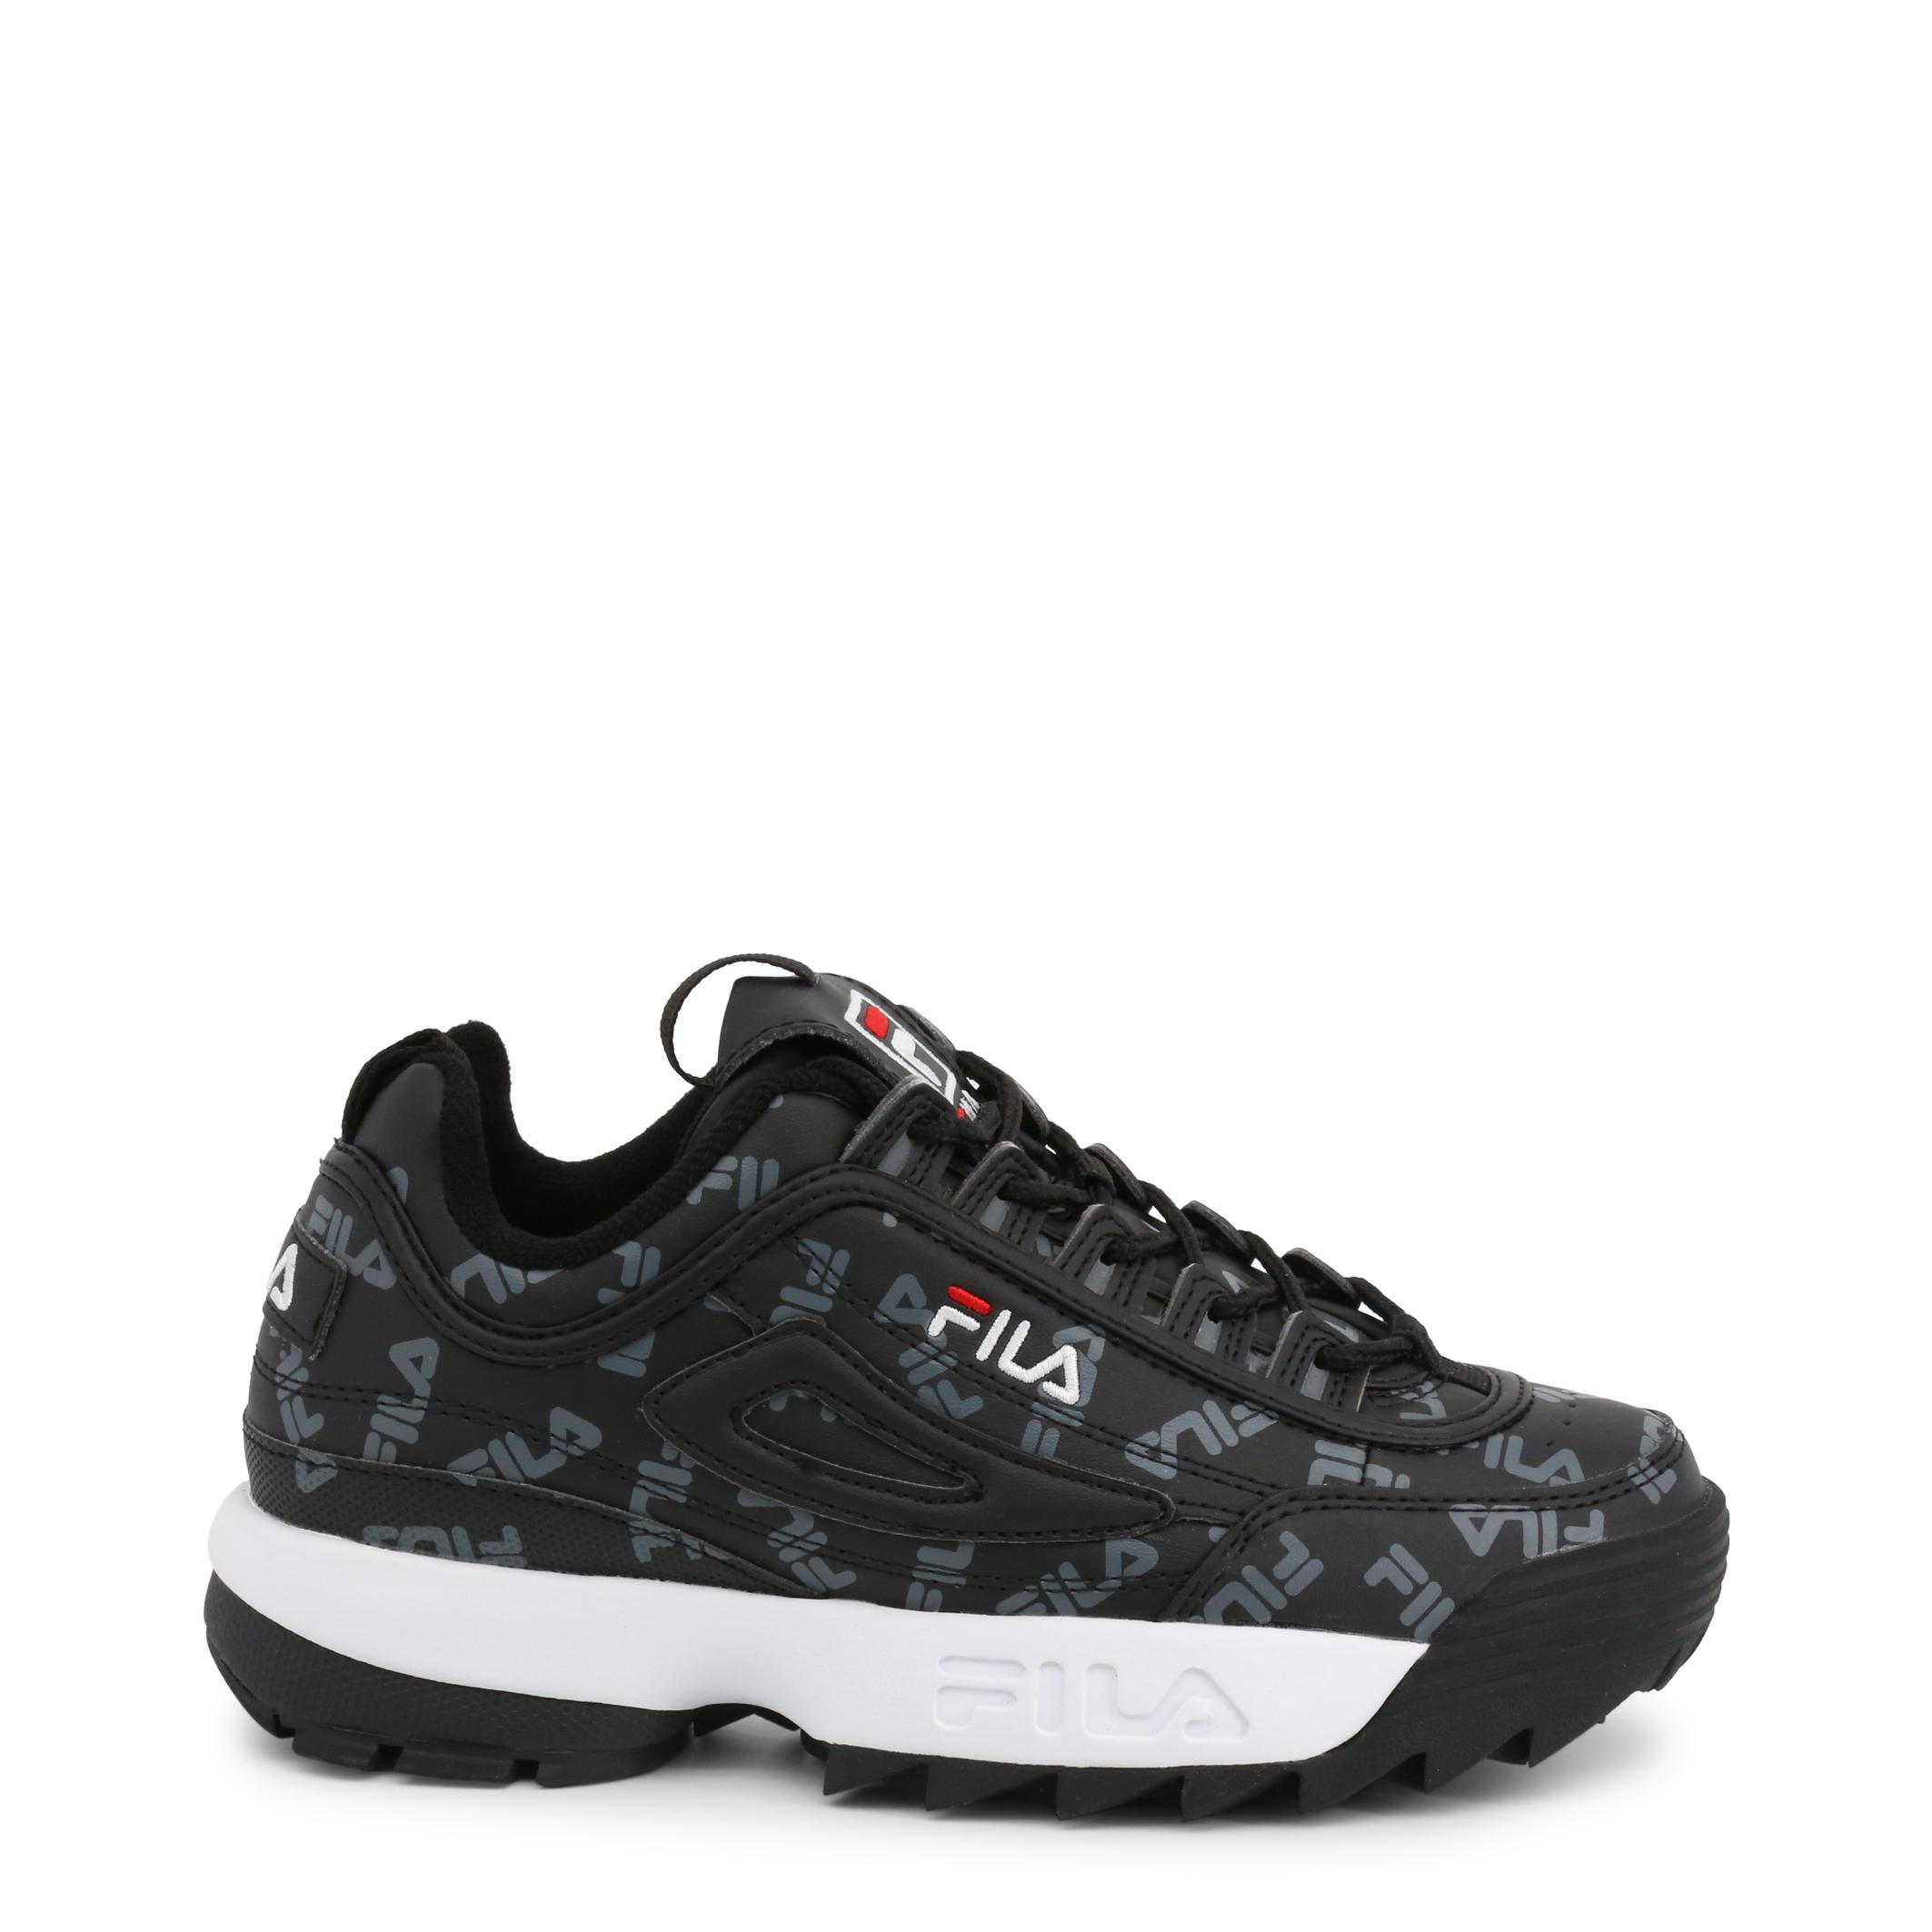 chaussure fila femme 2019